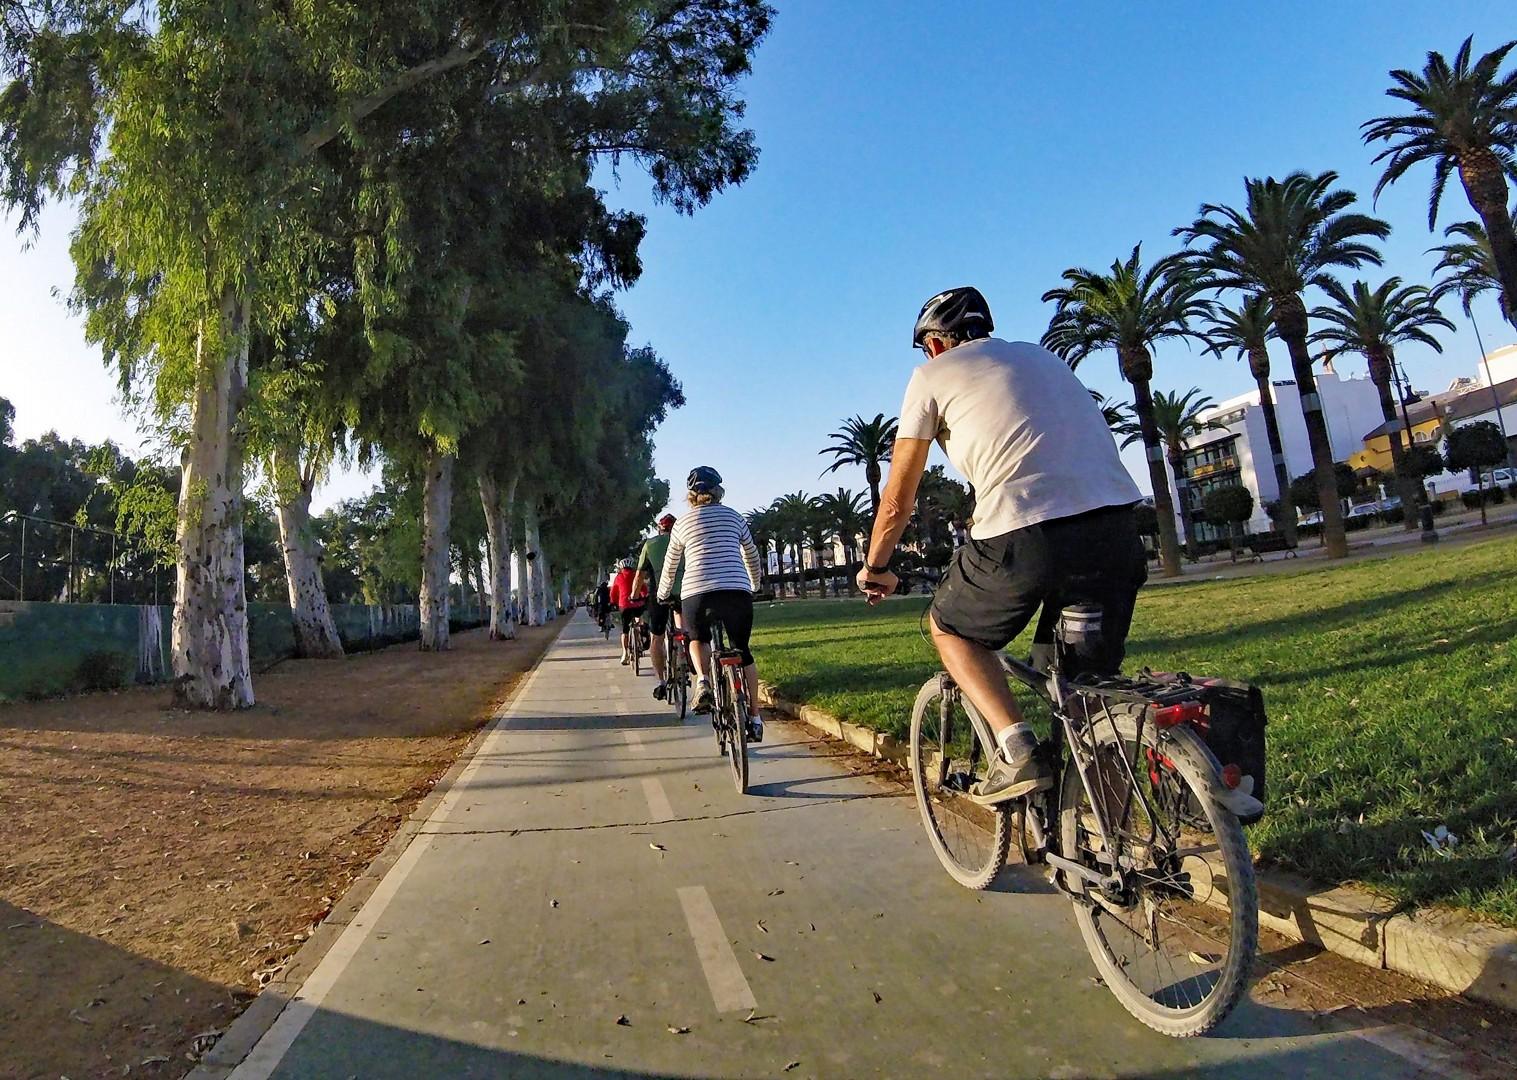 cycling-holiday-in-spain-granada-seville.jpg - Southern Spain - Granada to Seville - Guided Leisure Cycling Holiday - Leisure Cycling